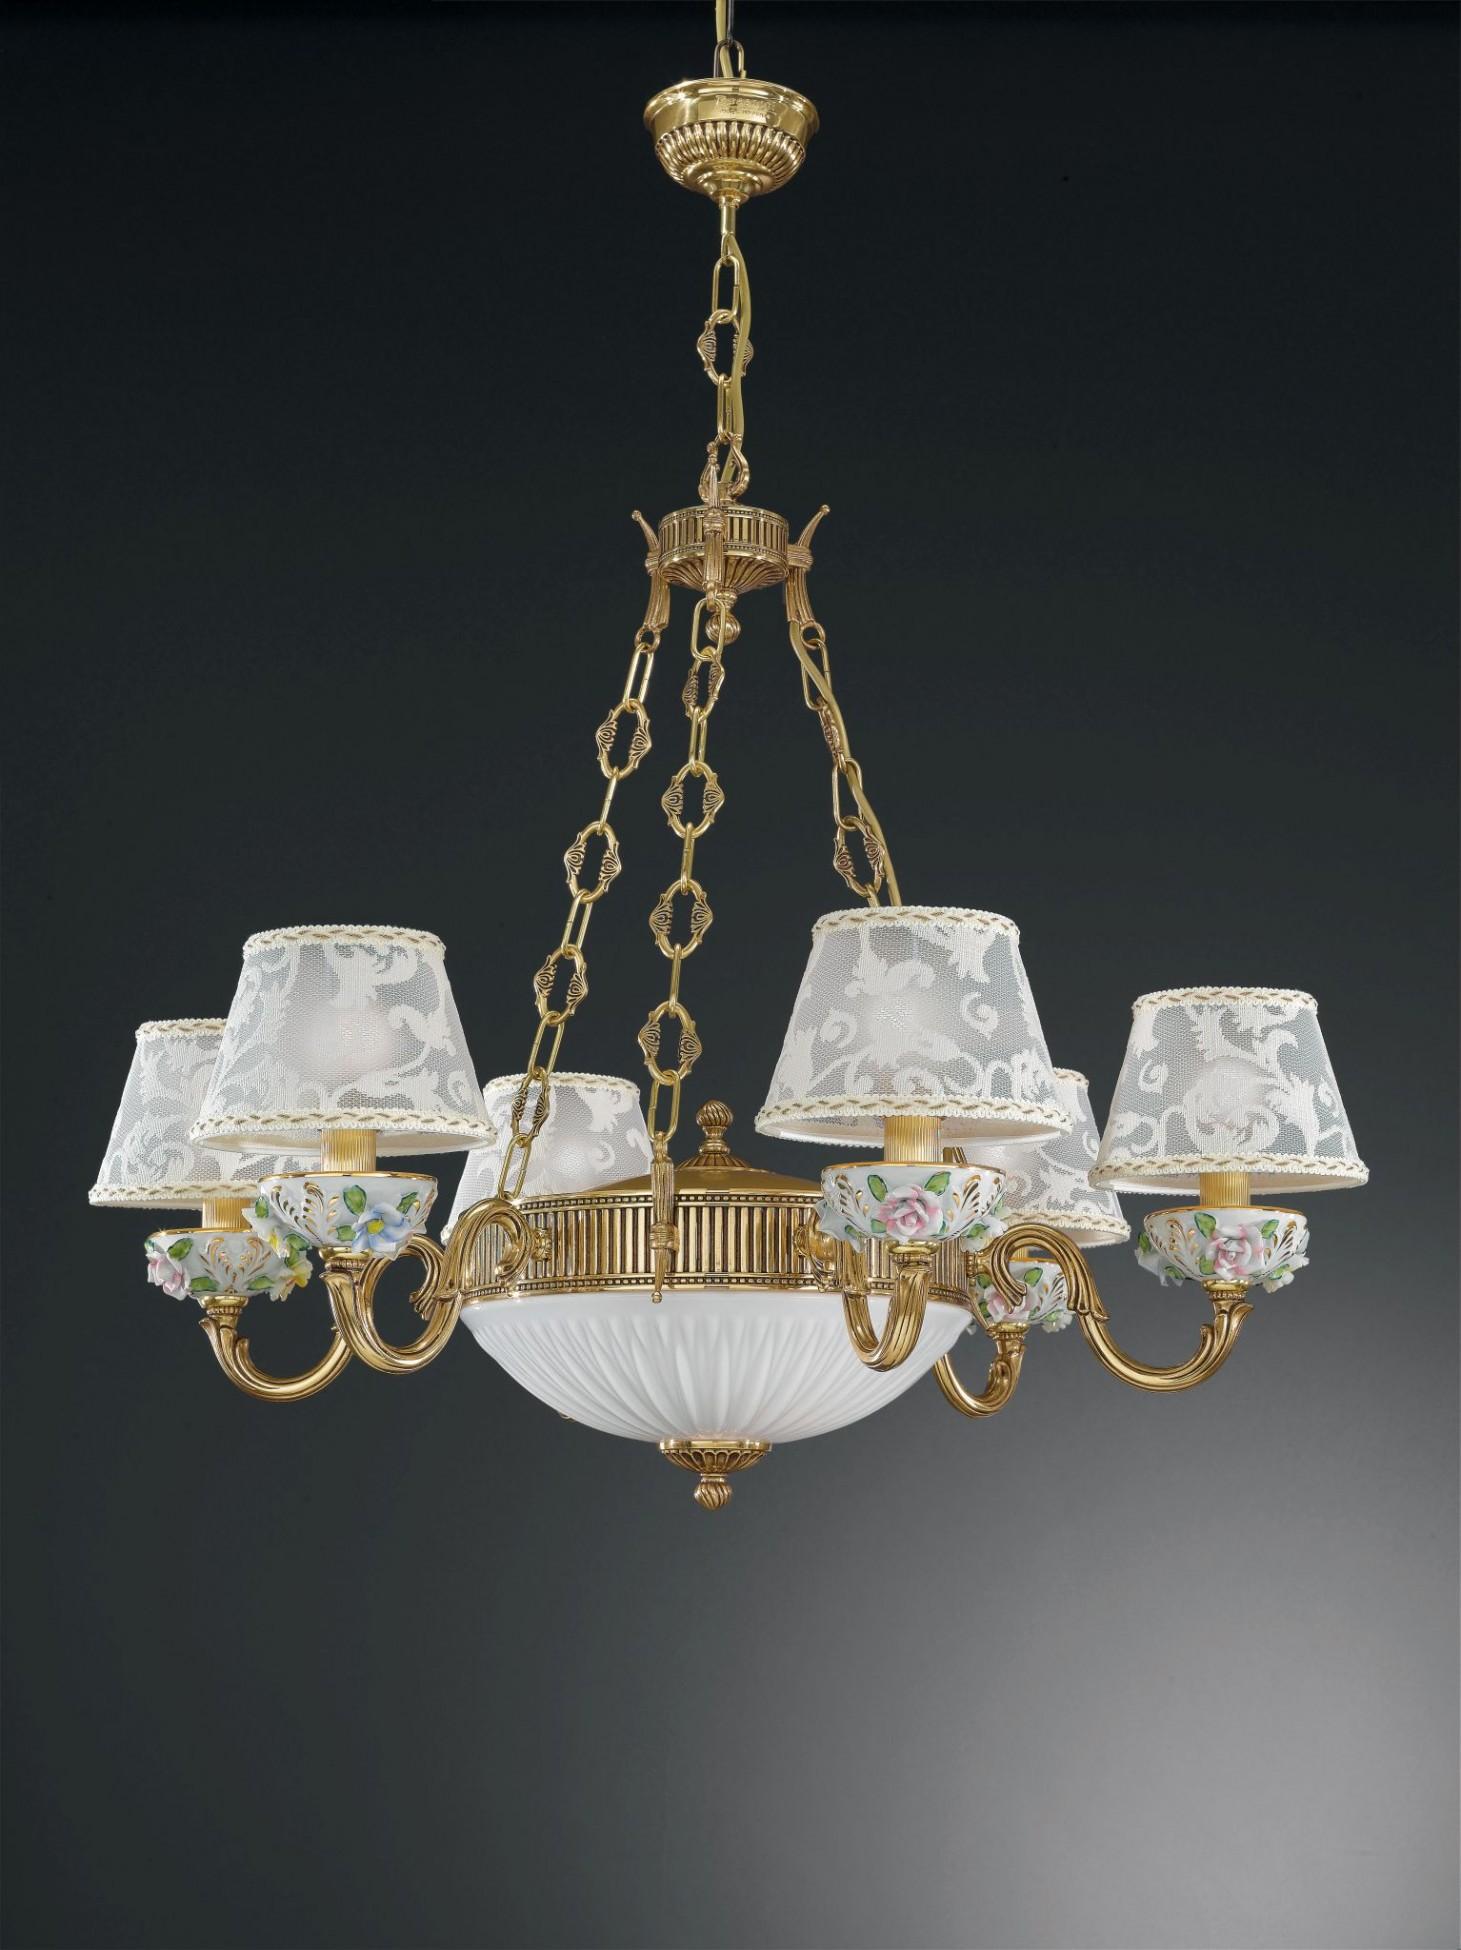 8 Lights Golden Brass And Painted Porcelain Chandelier